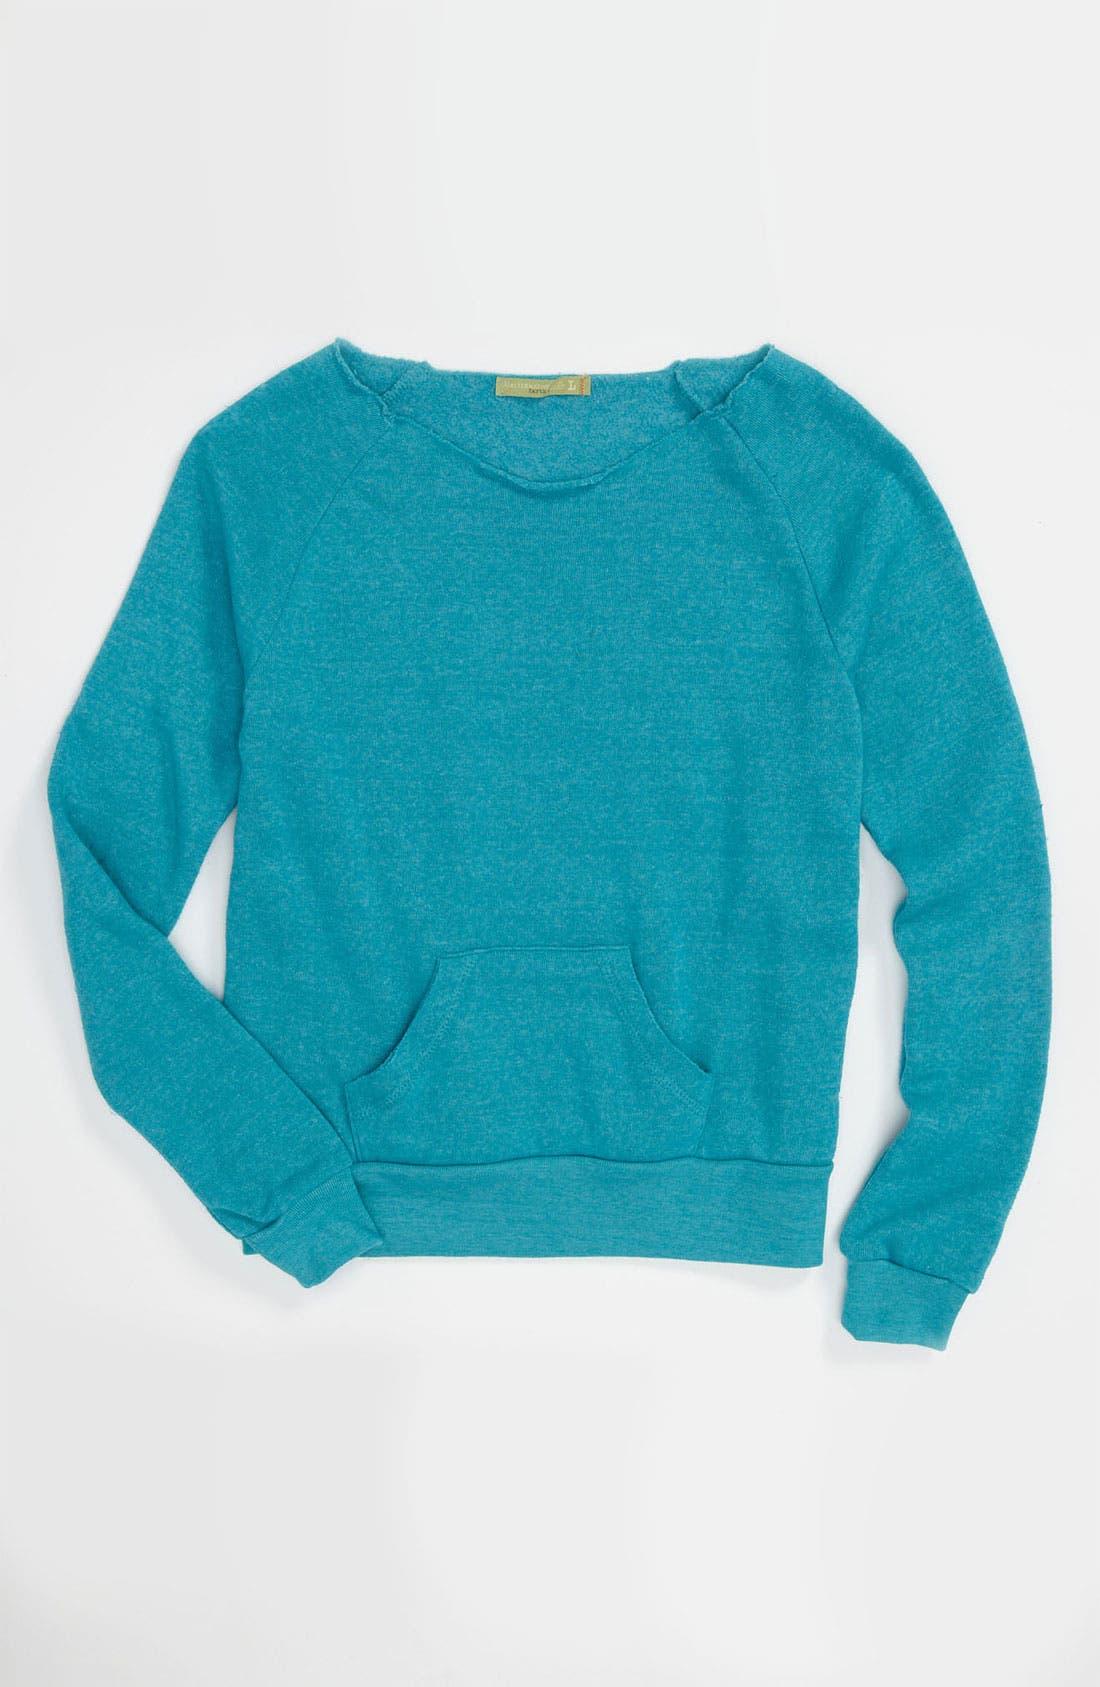 Alternate Image 1 Selected - Alternative 'Maniac' Fleece Sweater (Big Girls)